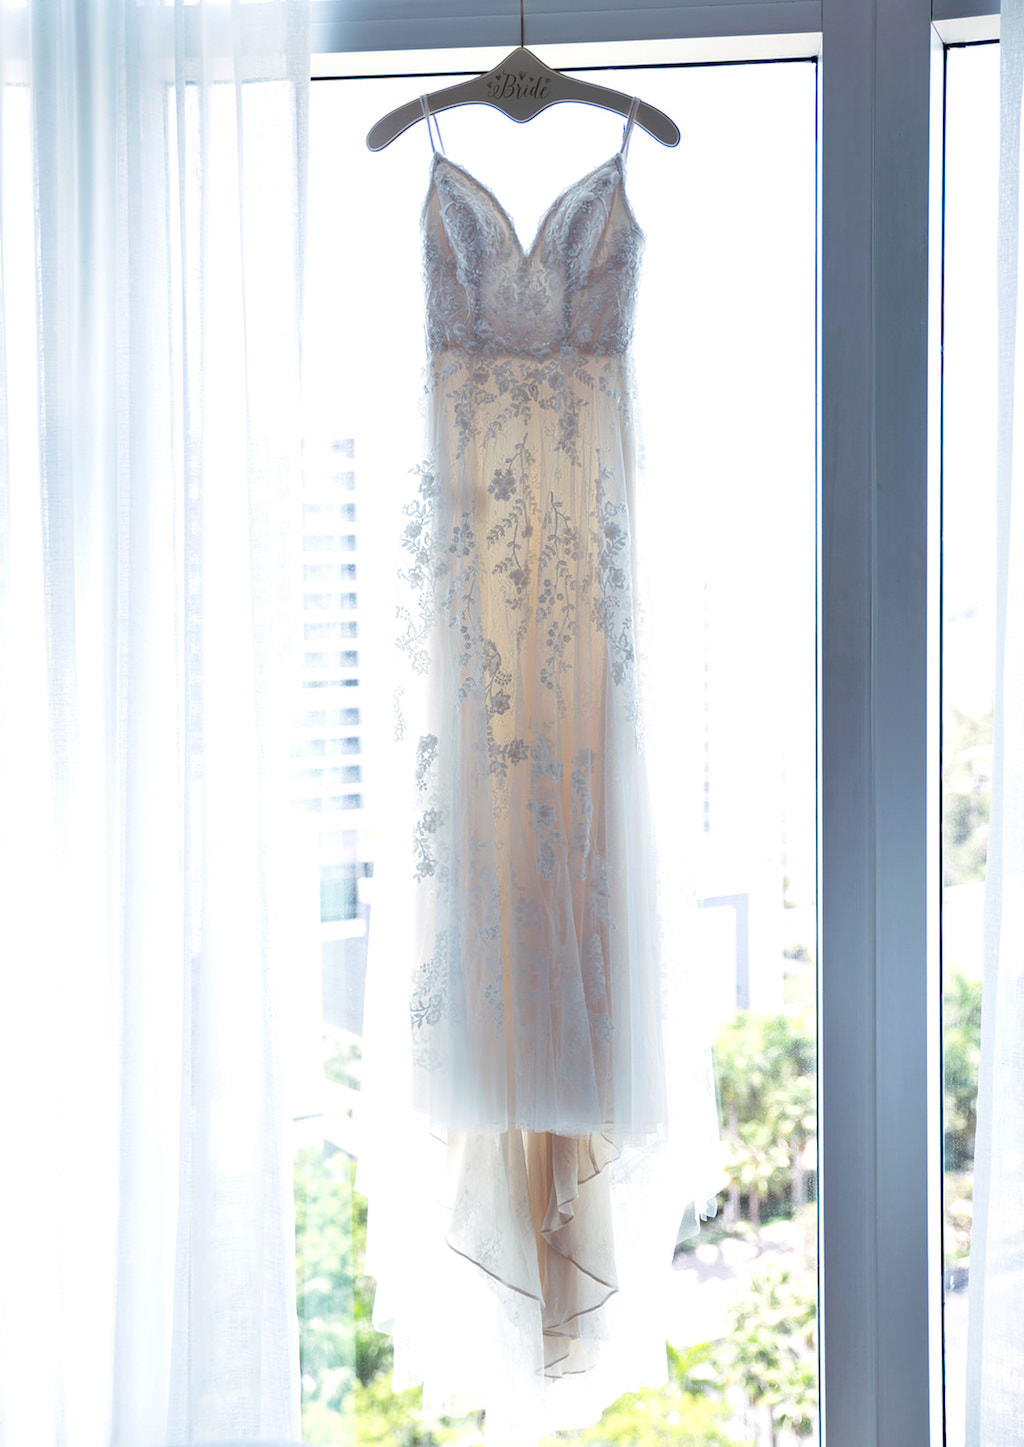 Lace and Illusion Romantic Plunging V Neckline with Spaghetti Straps Paloma Blanca Wedding Dress